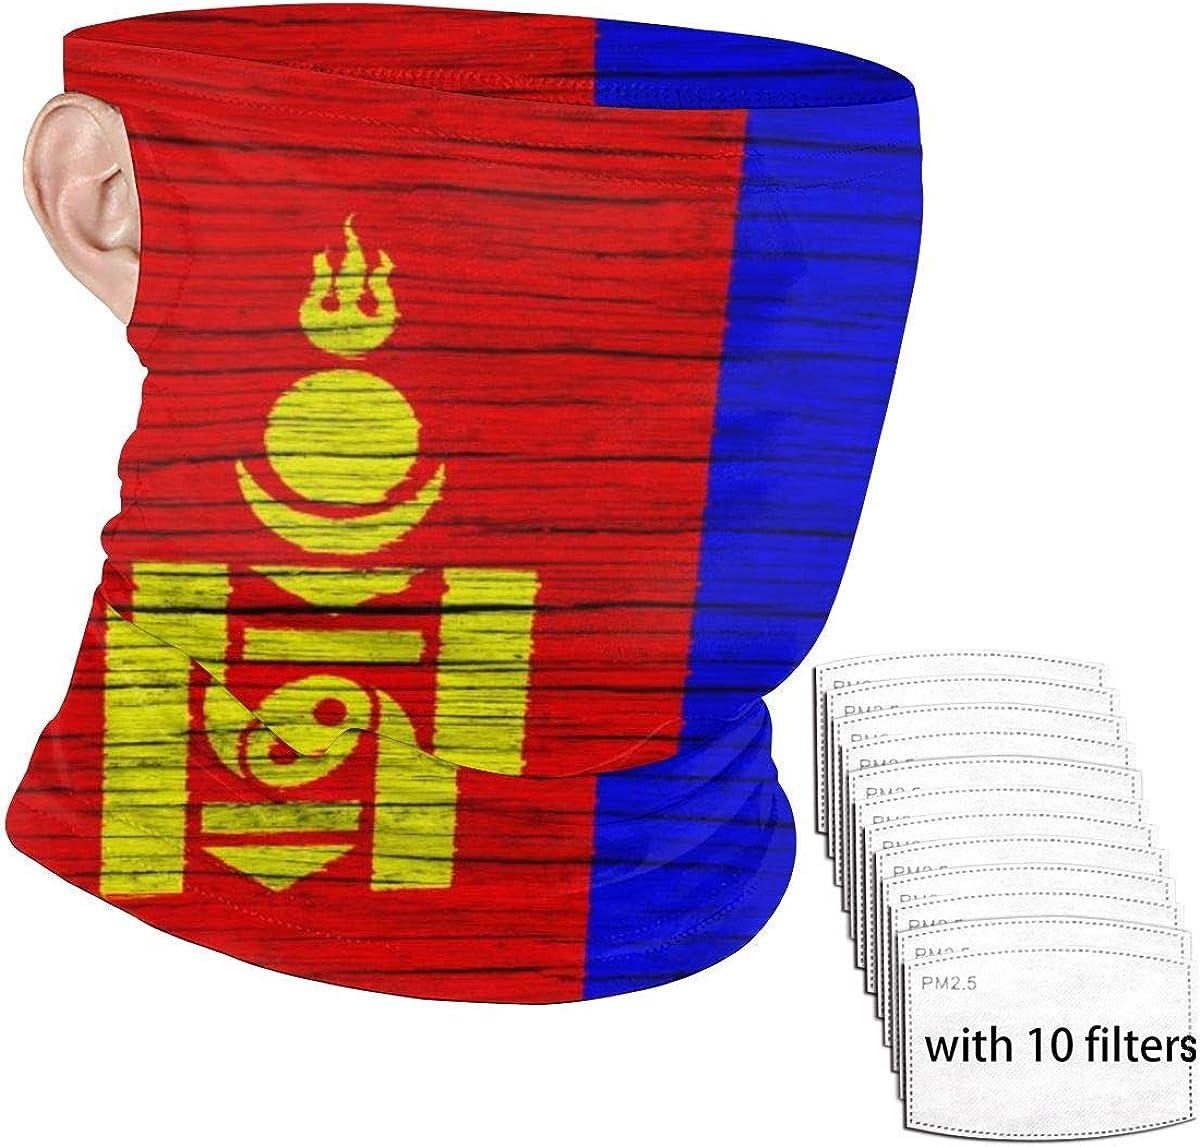 Mongolia Wooden Texture Mongolian Flag Face Nose And Mouth Pm2.5 Filter Dust Mask Scarf Bandana Reusable Balaclava